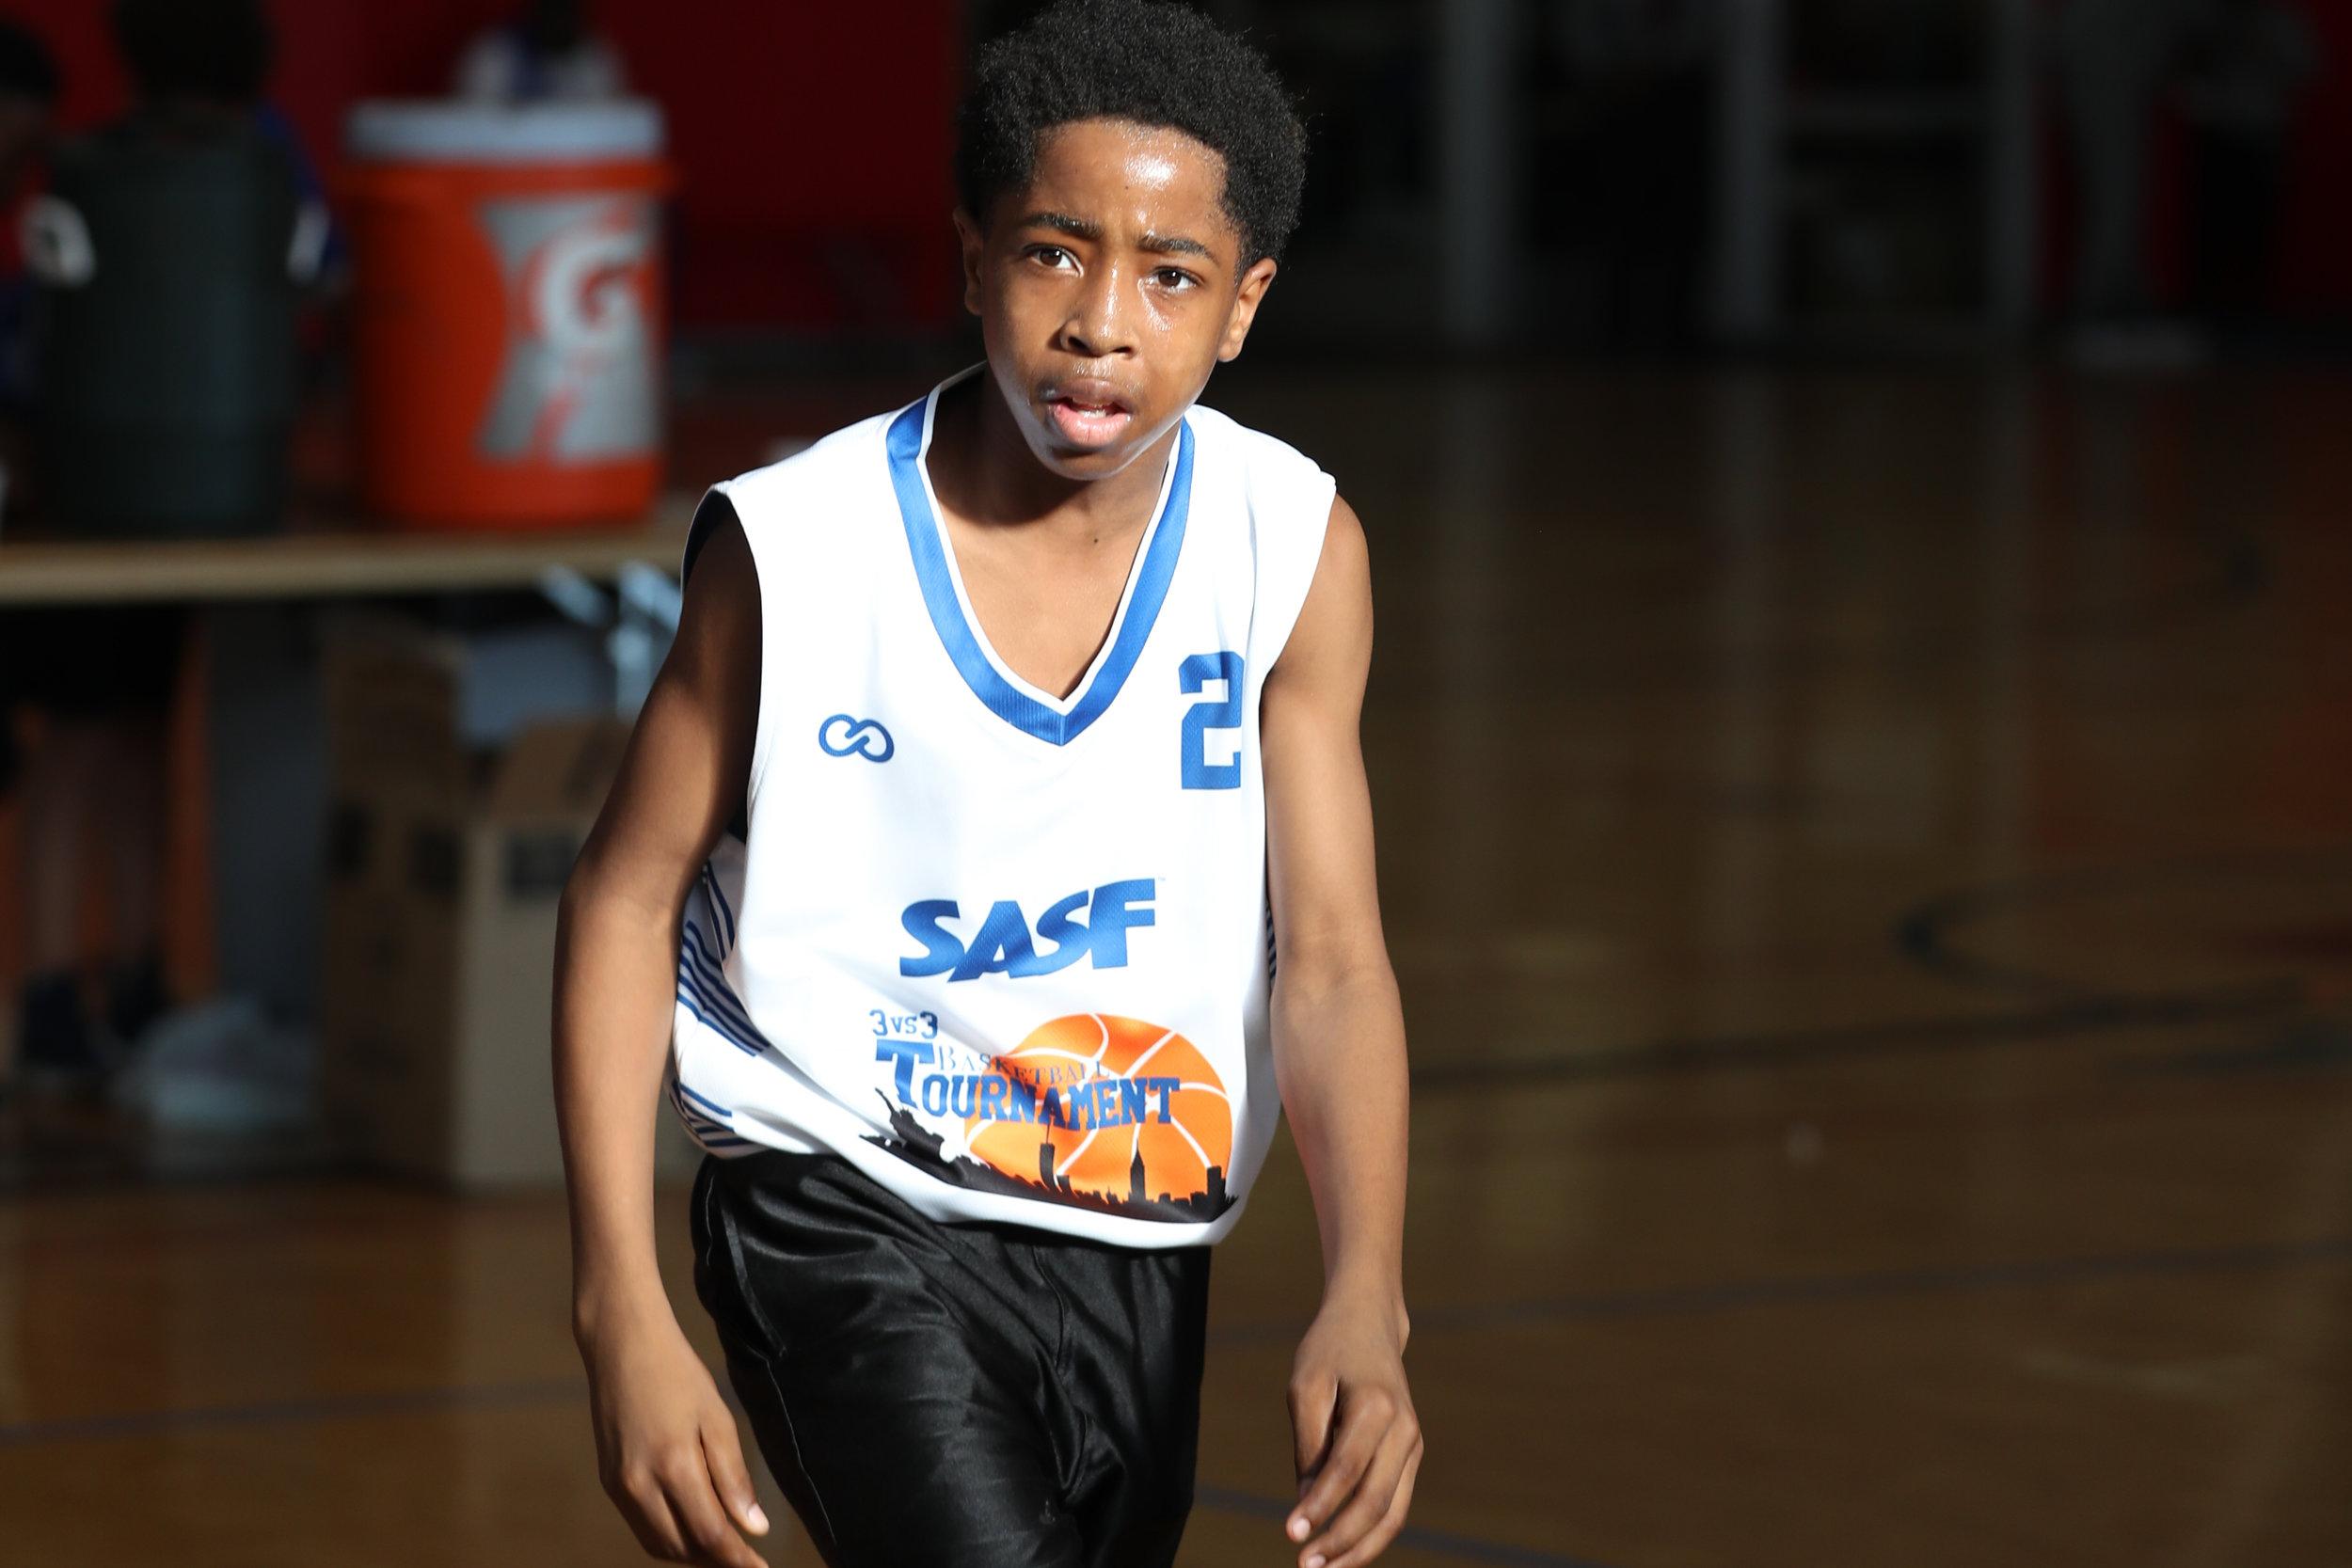 SASF white blue orange black Youth Basketball Uniforms, jerseys, and shorts